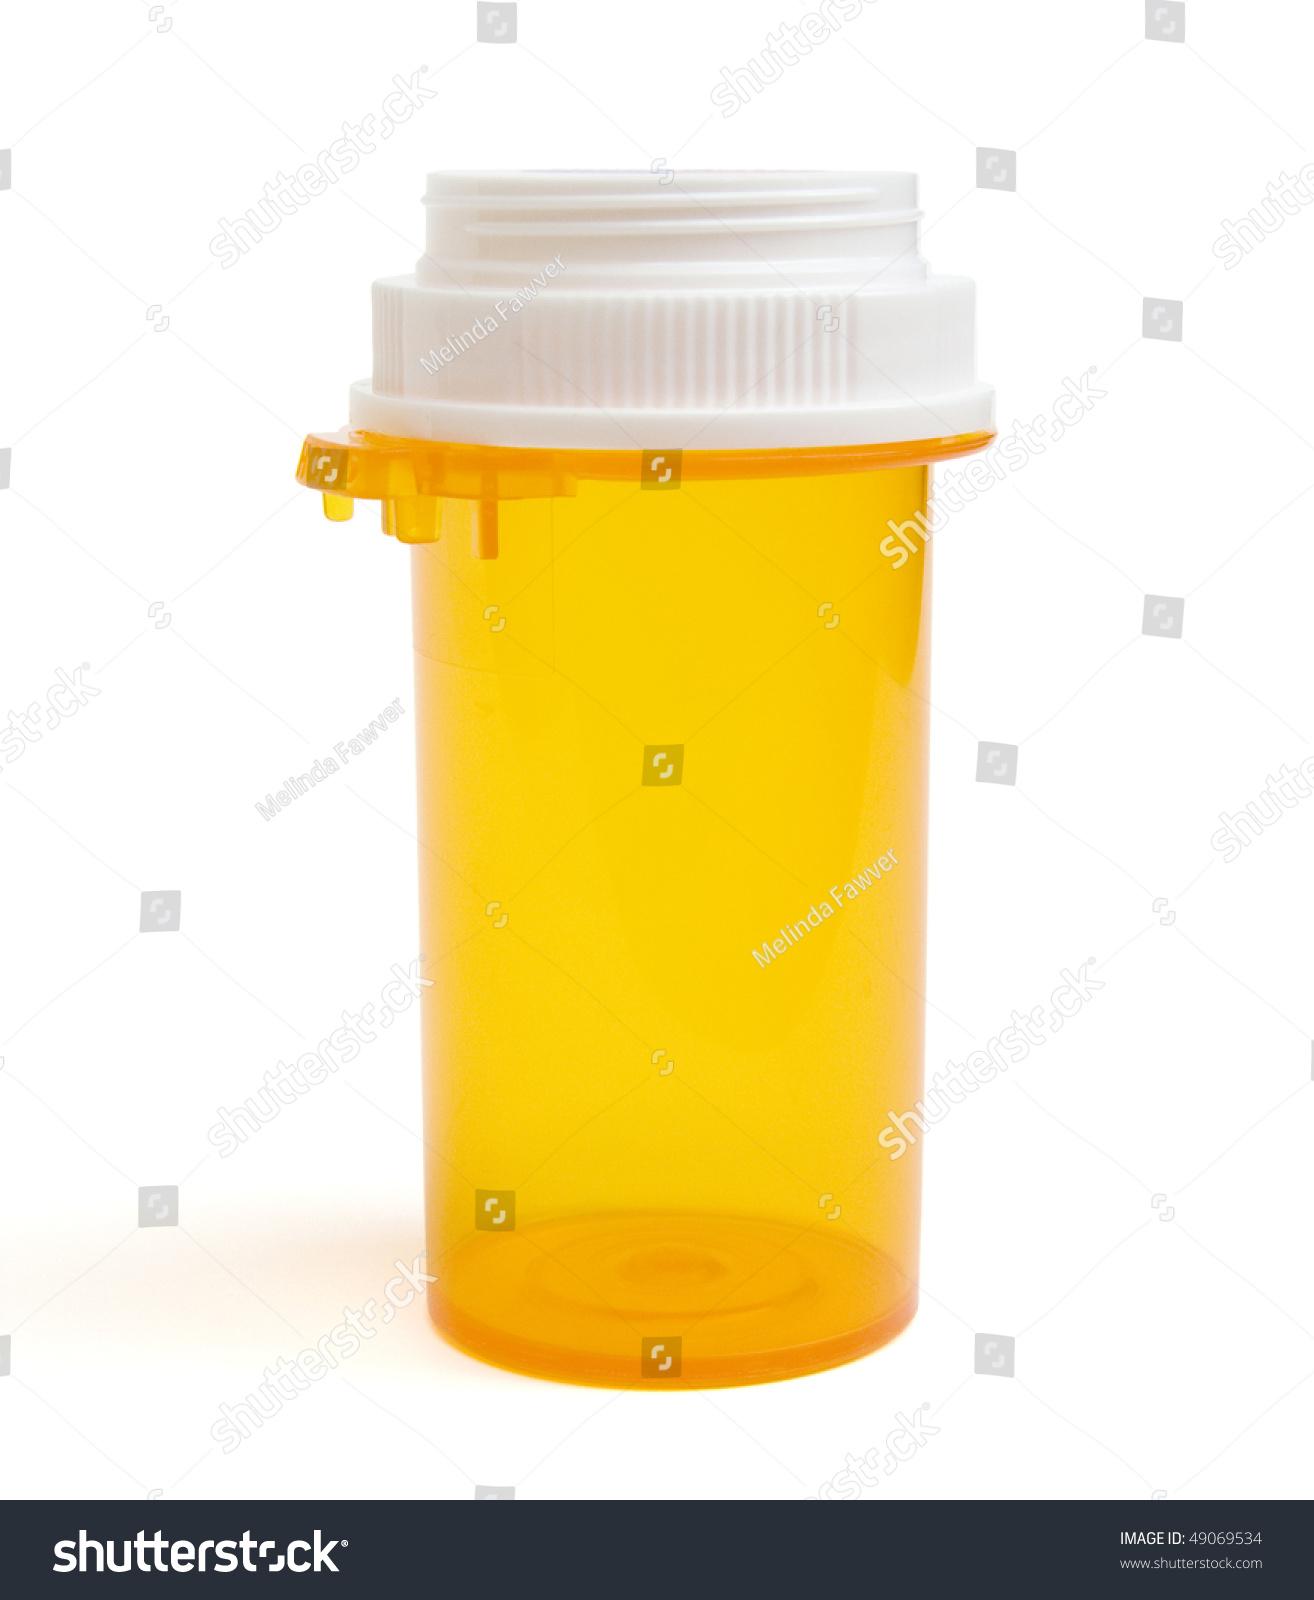 Empty prescription pill bottle stock photo 49069534 for What to do with empty prescription bottles